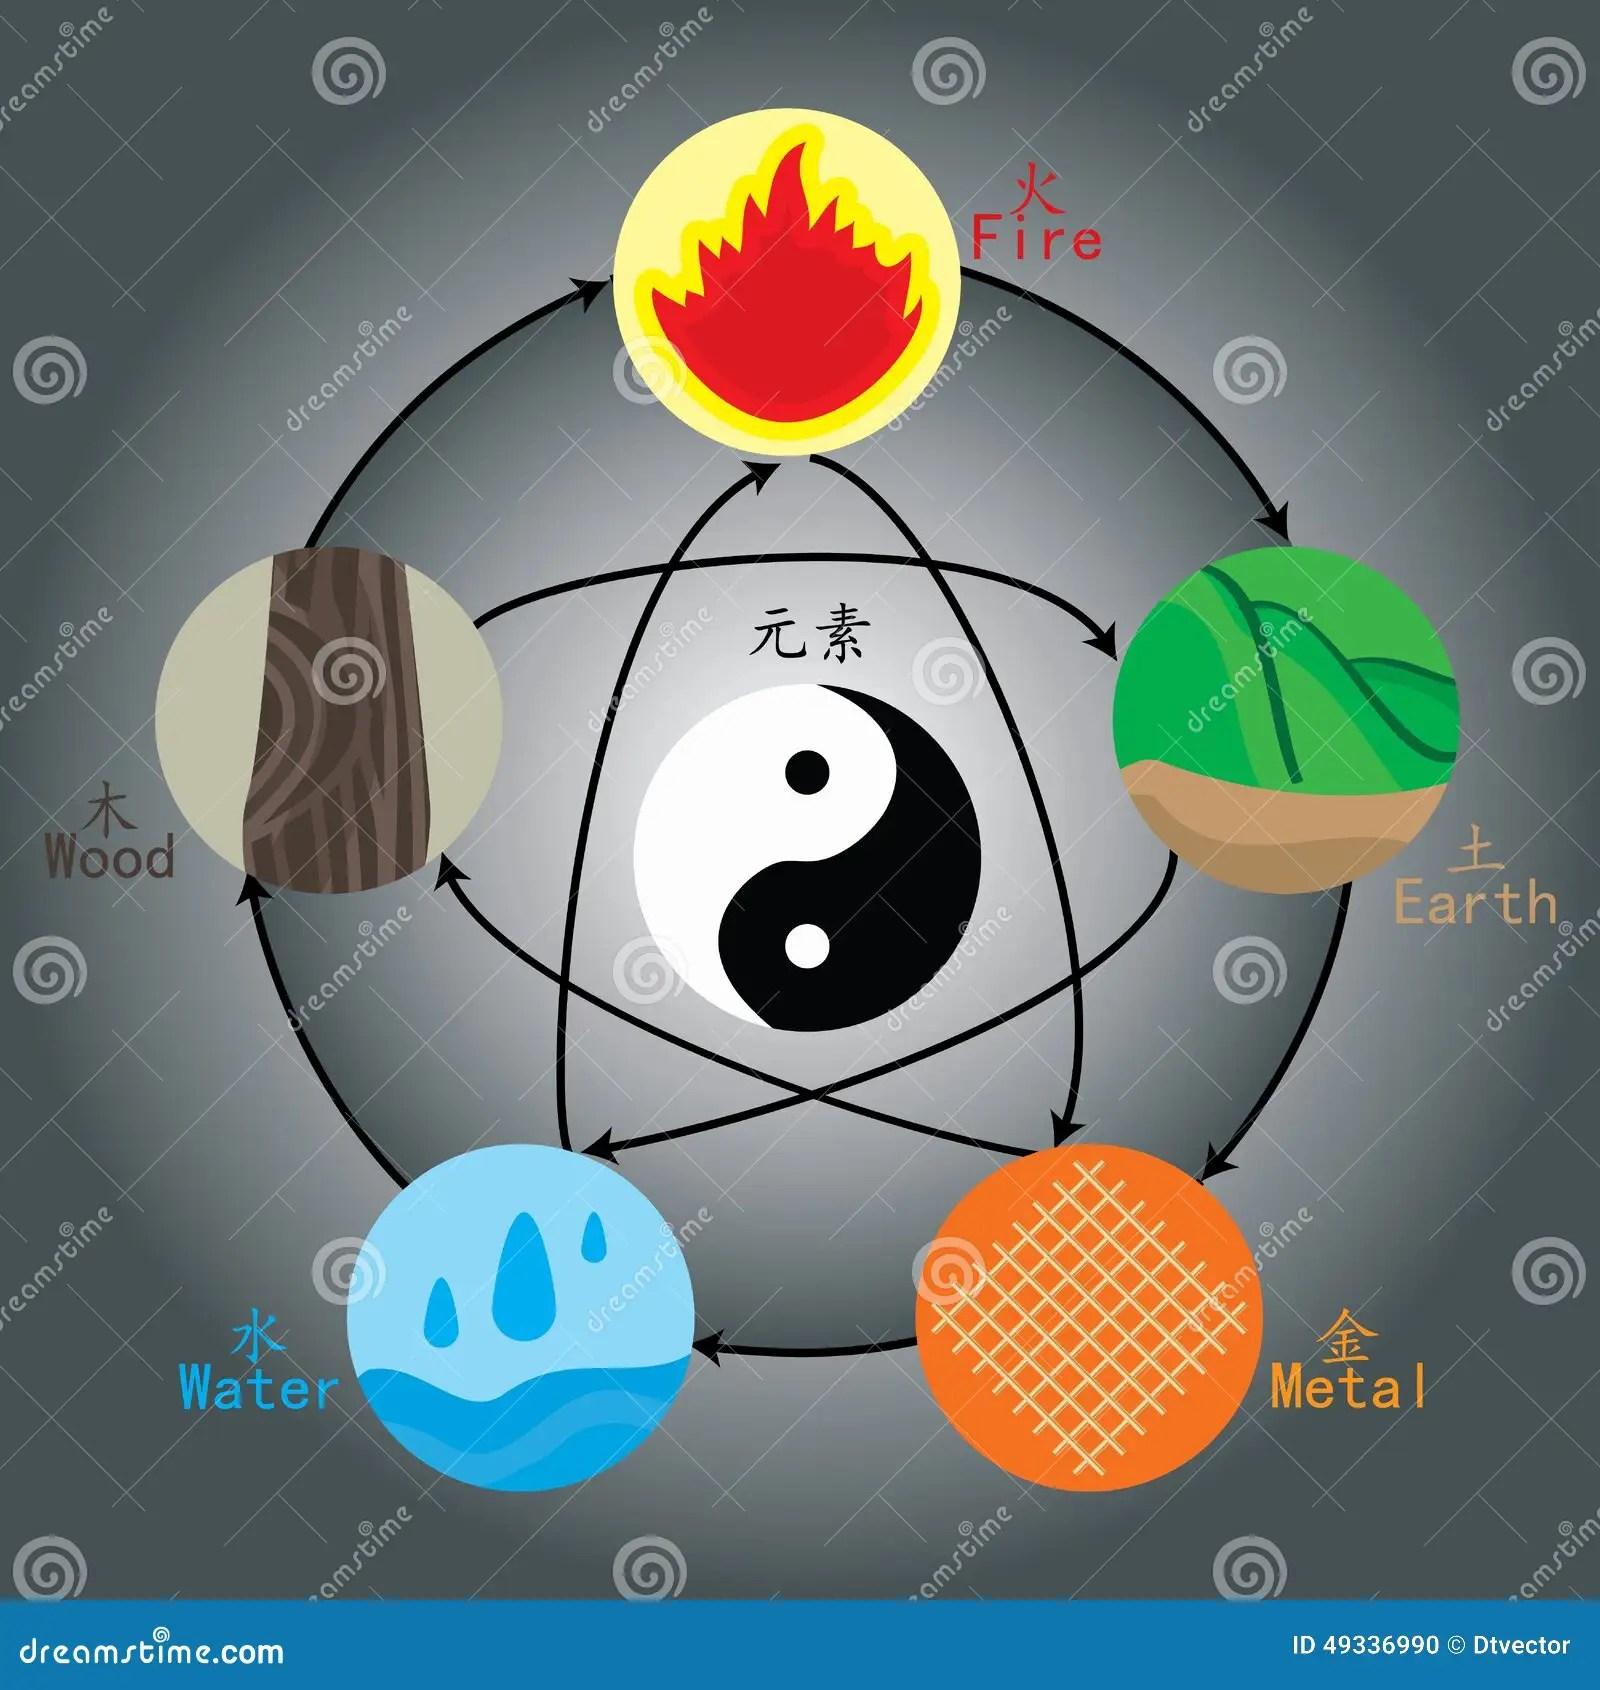 Five Elements Wood Water